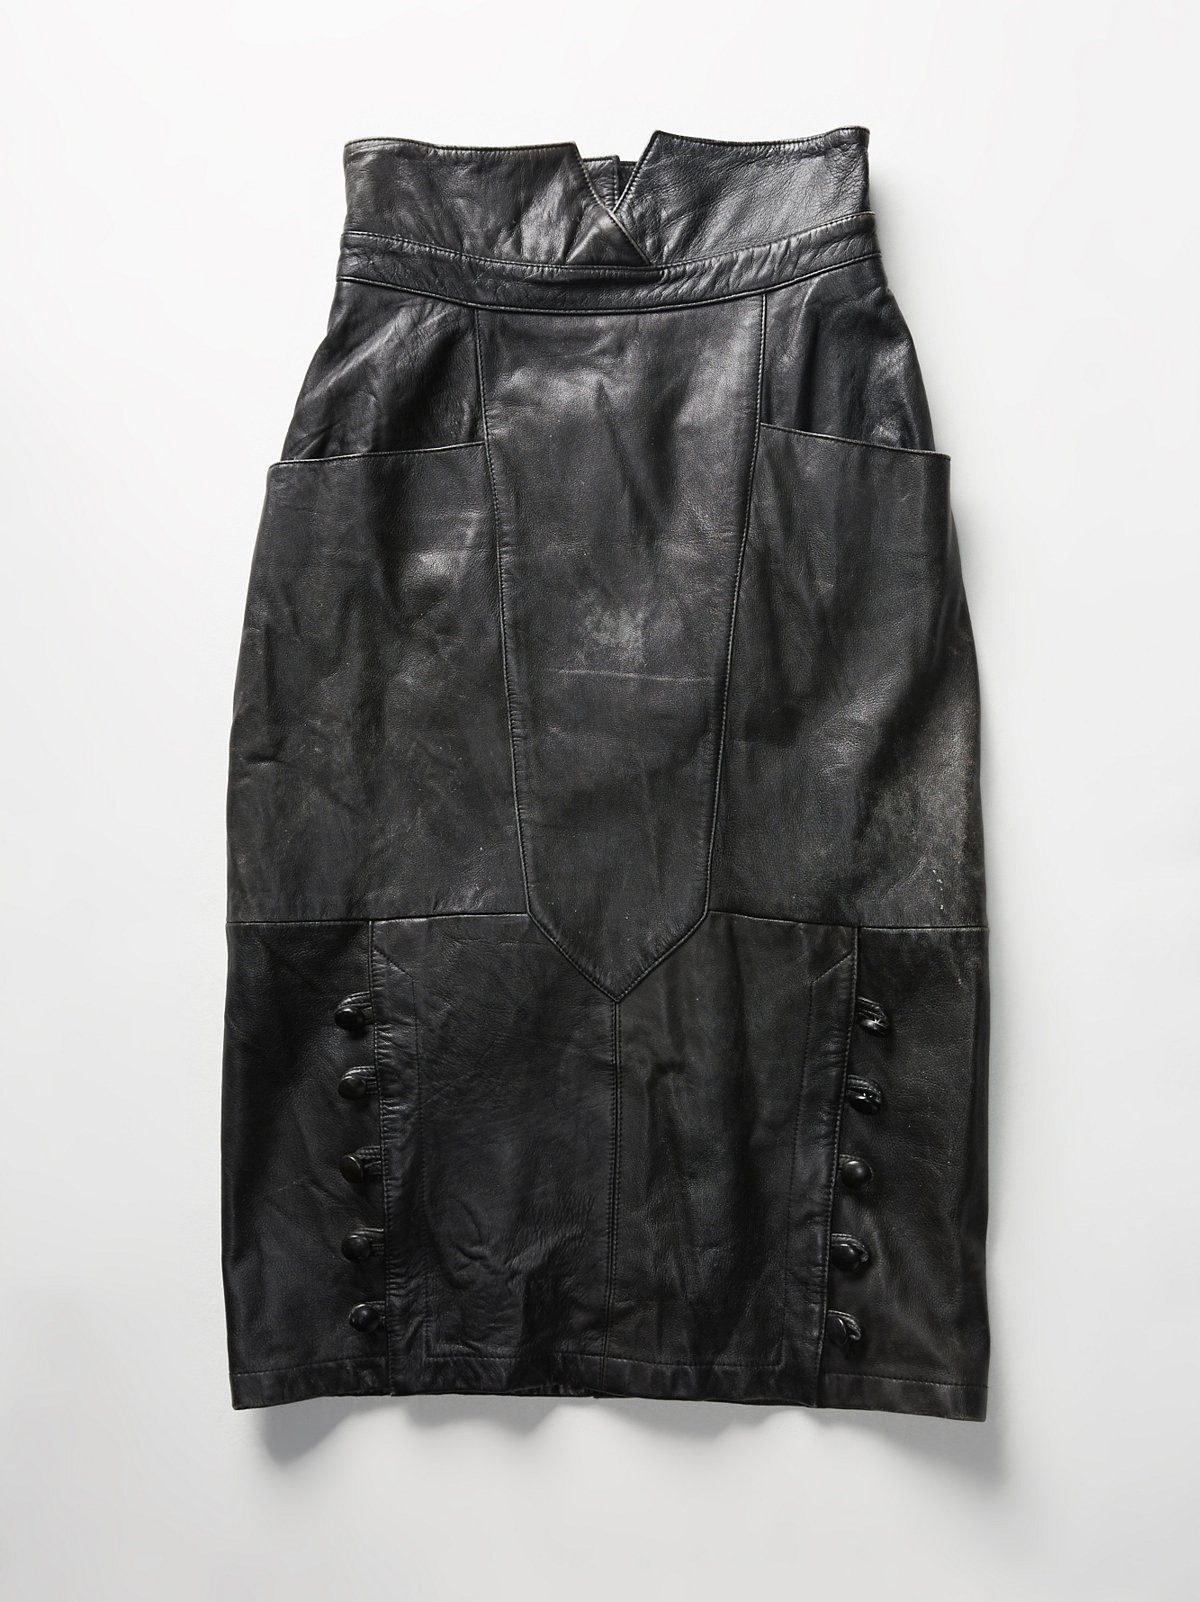 Vintage 1980s Leather Skirt